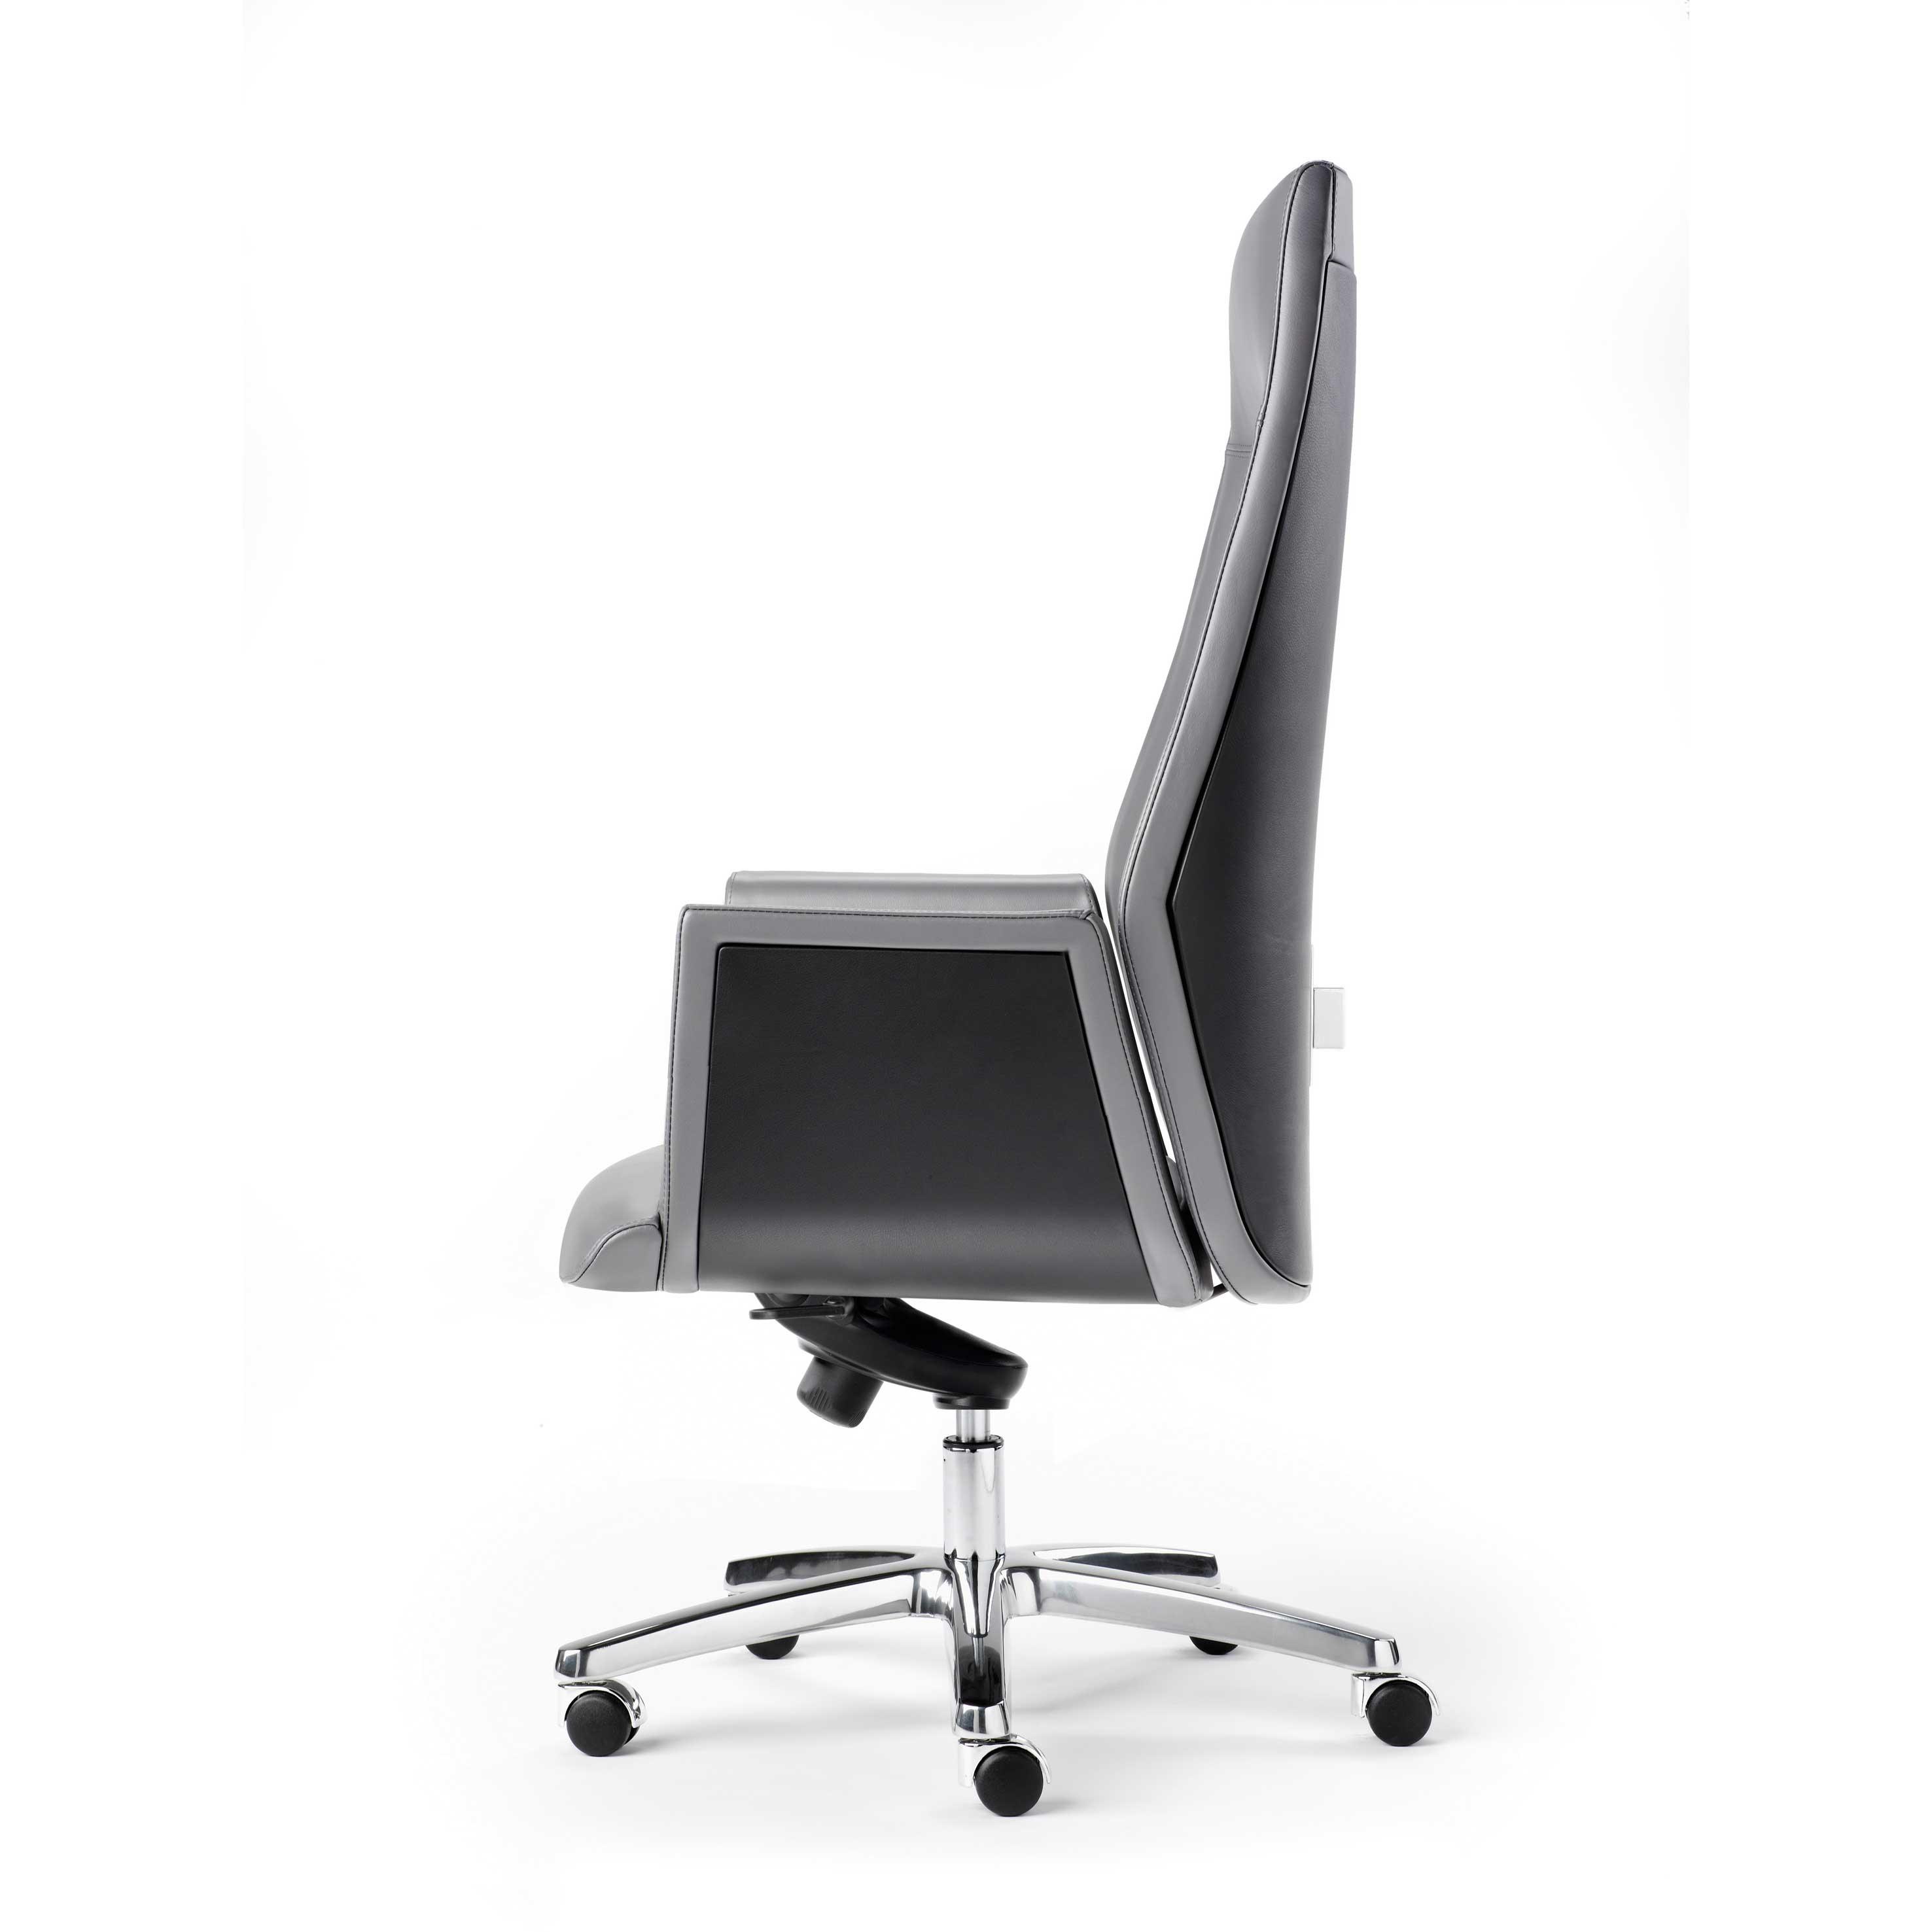 08S_Estel_Comfort&Relax_Office-Chair_Tua